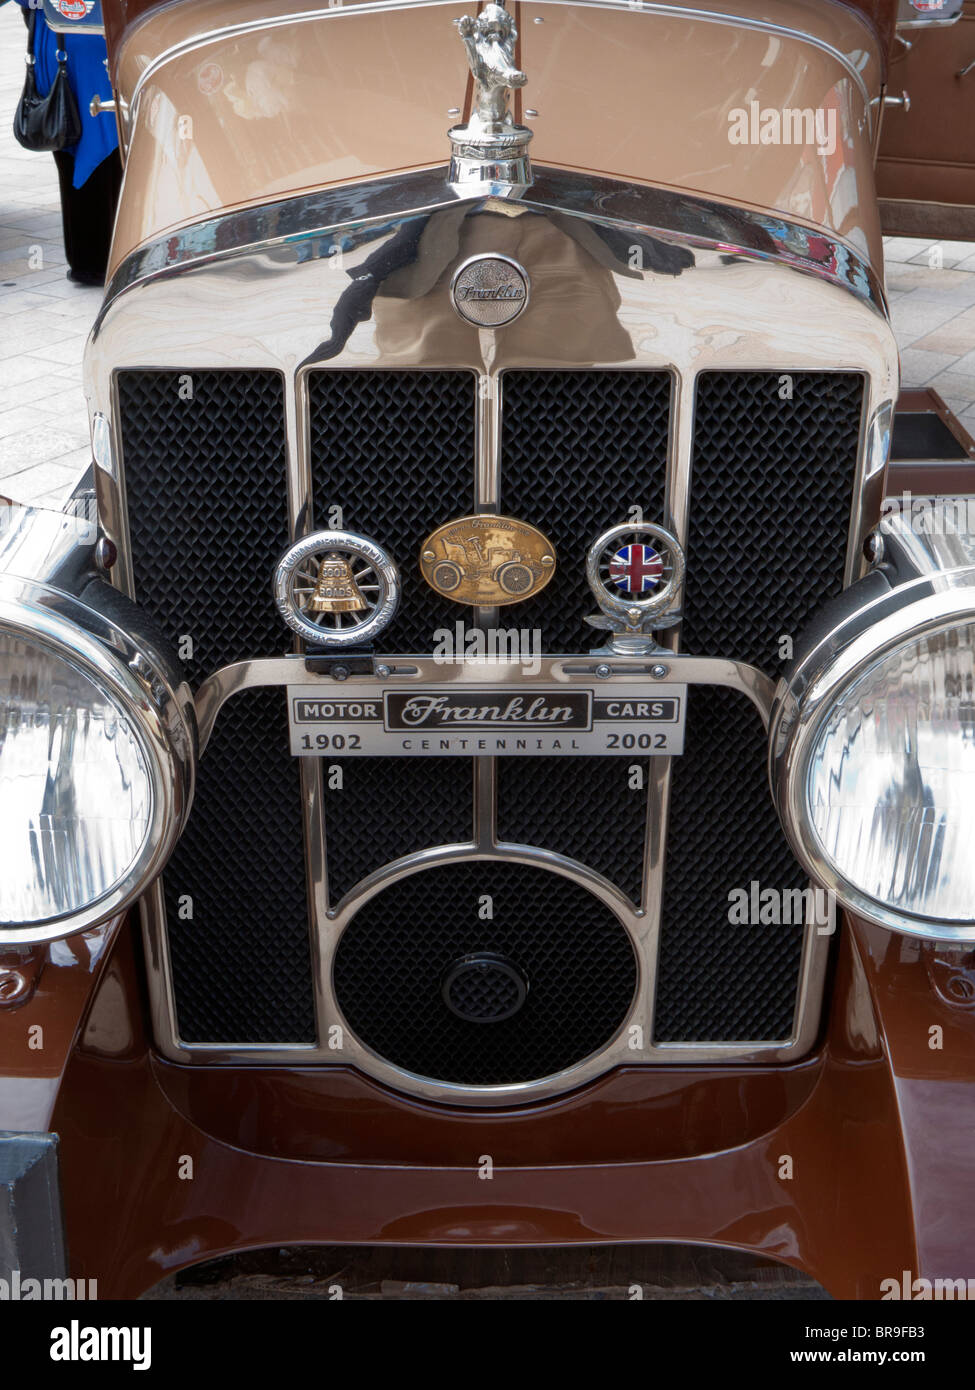 Franklin Motor Car - Stock Image